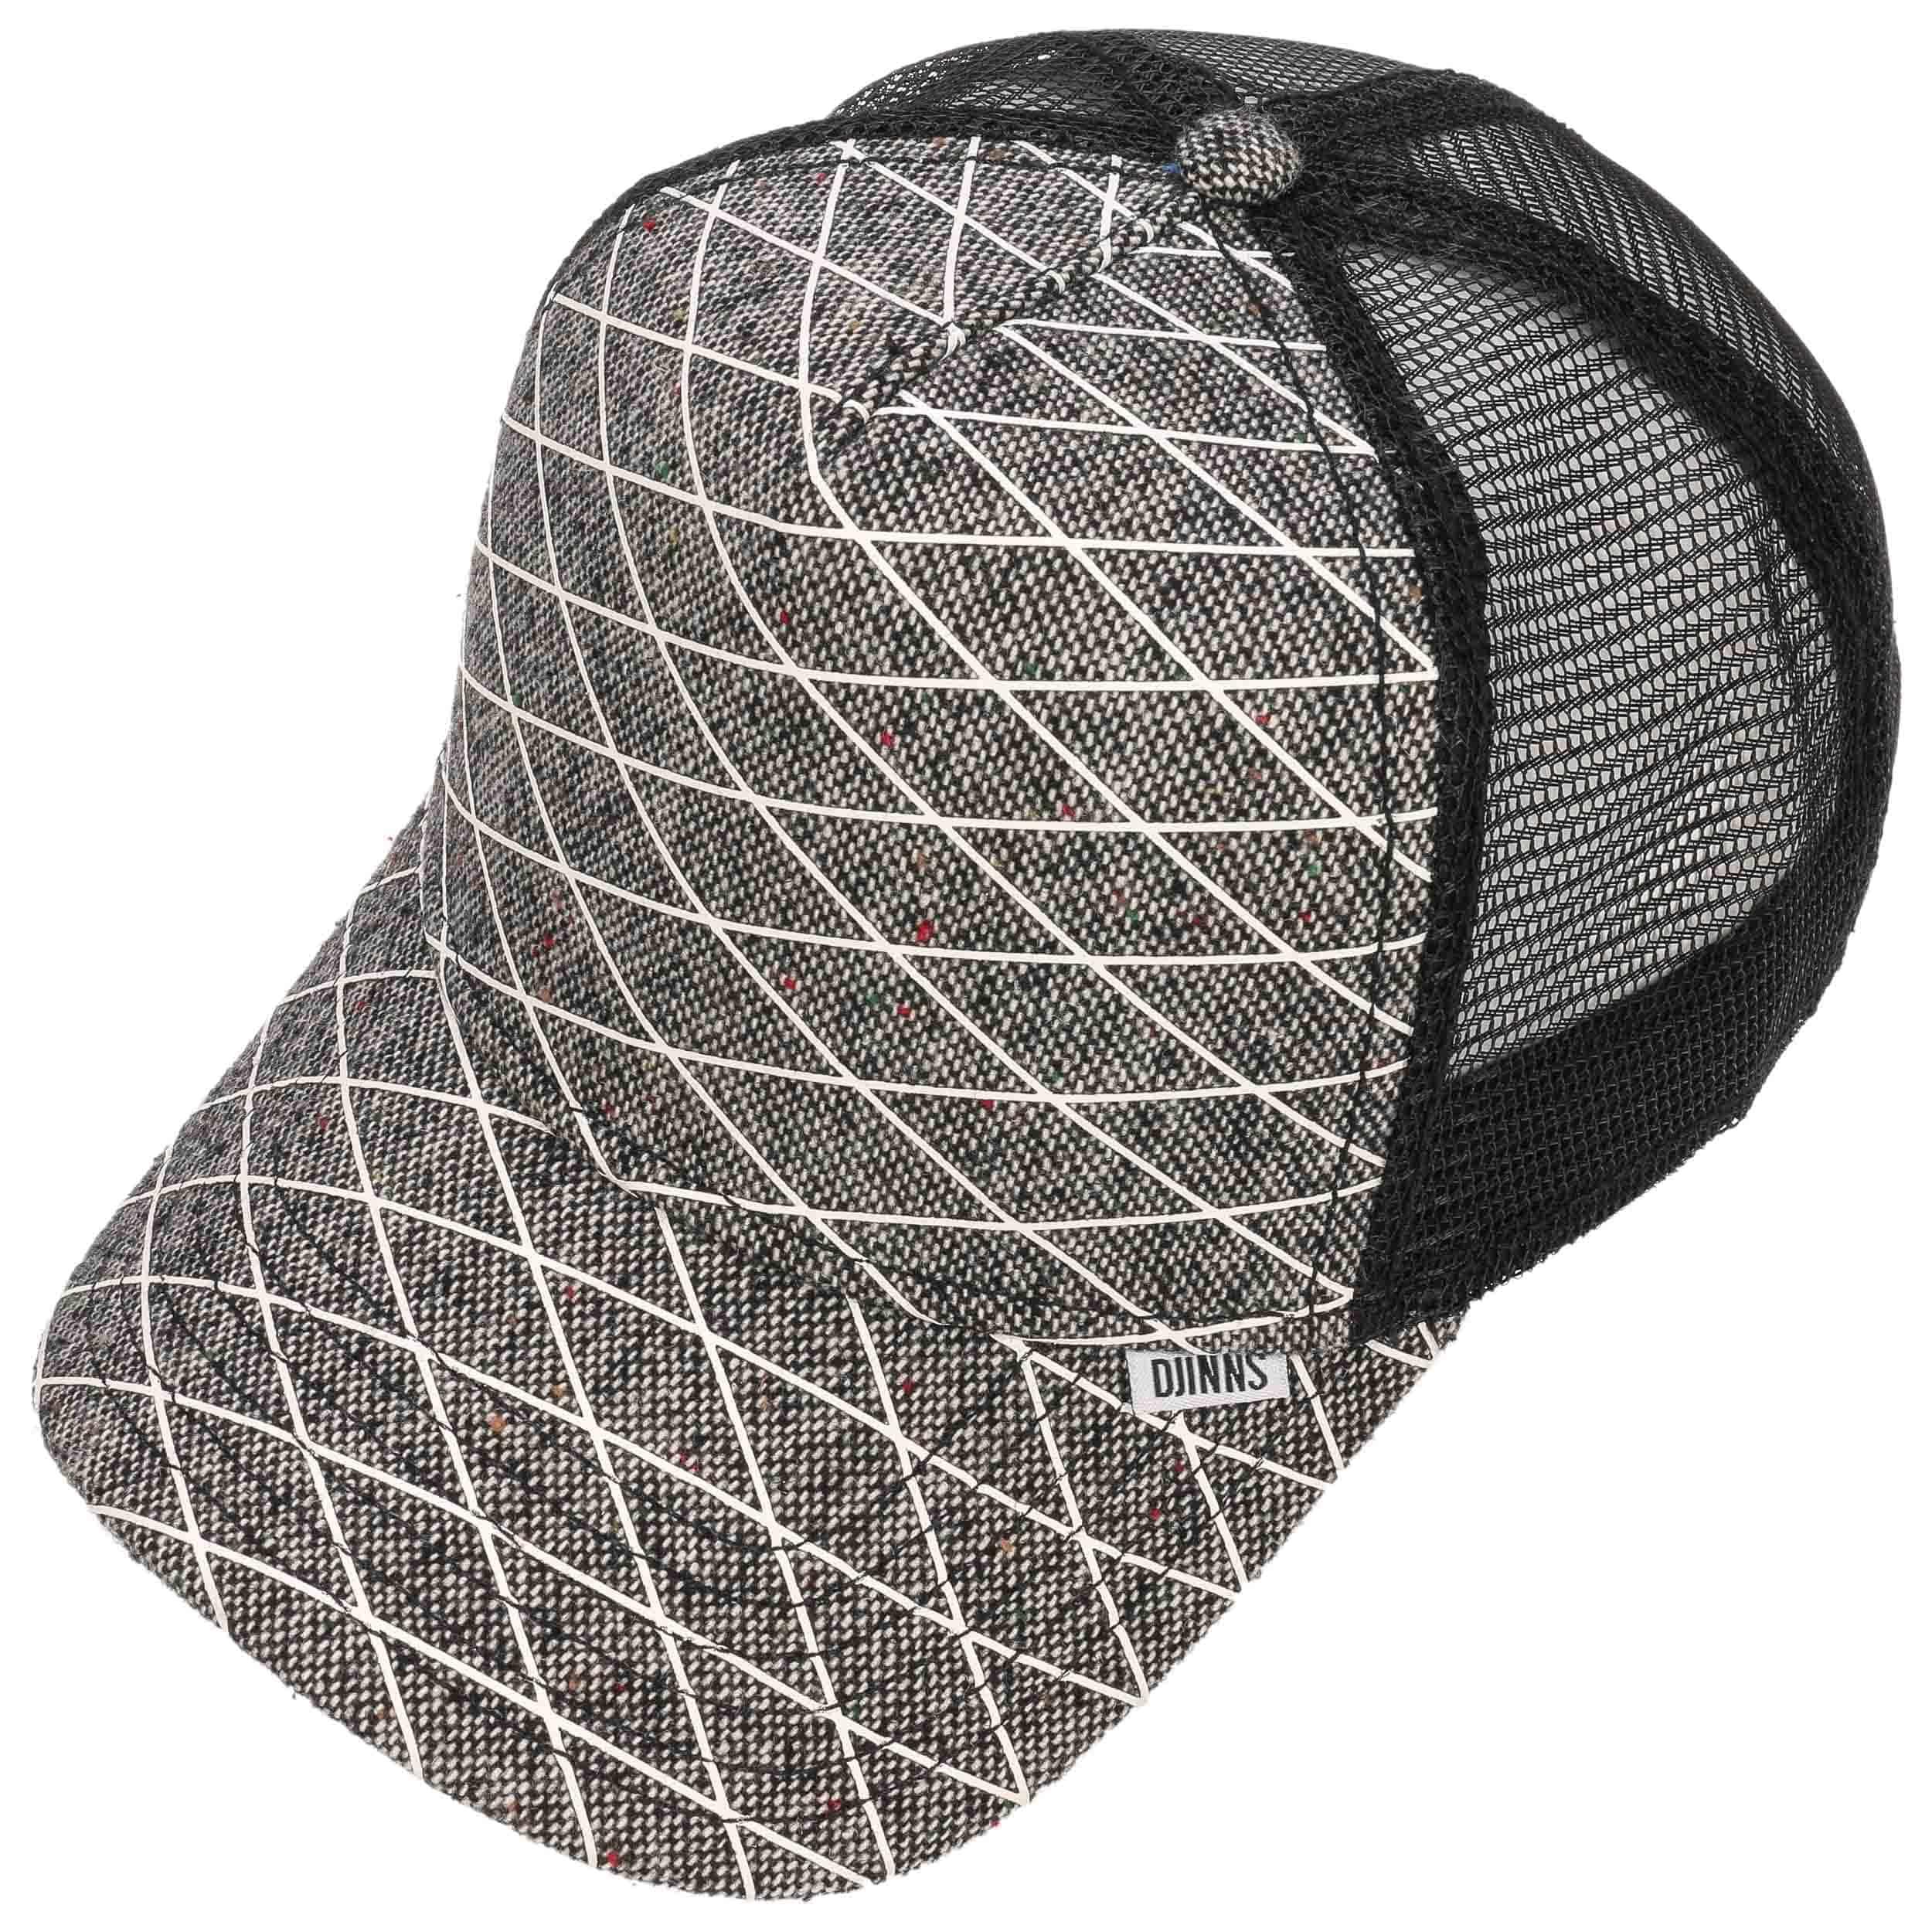 rubber tweed hft trucker cap by djinns gbp 22 95 hats. Black Bedroom Furniture Sets. Home Design Ideas